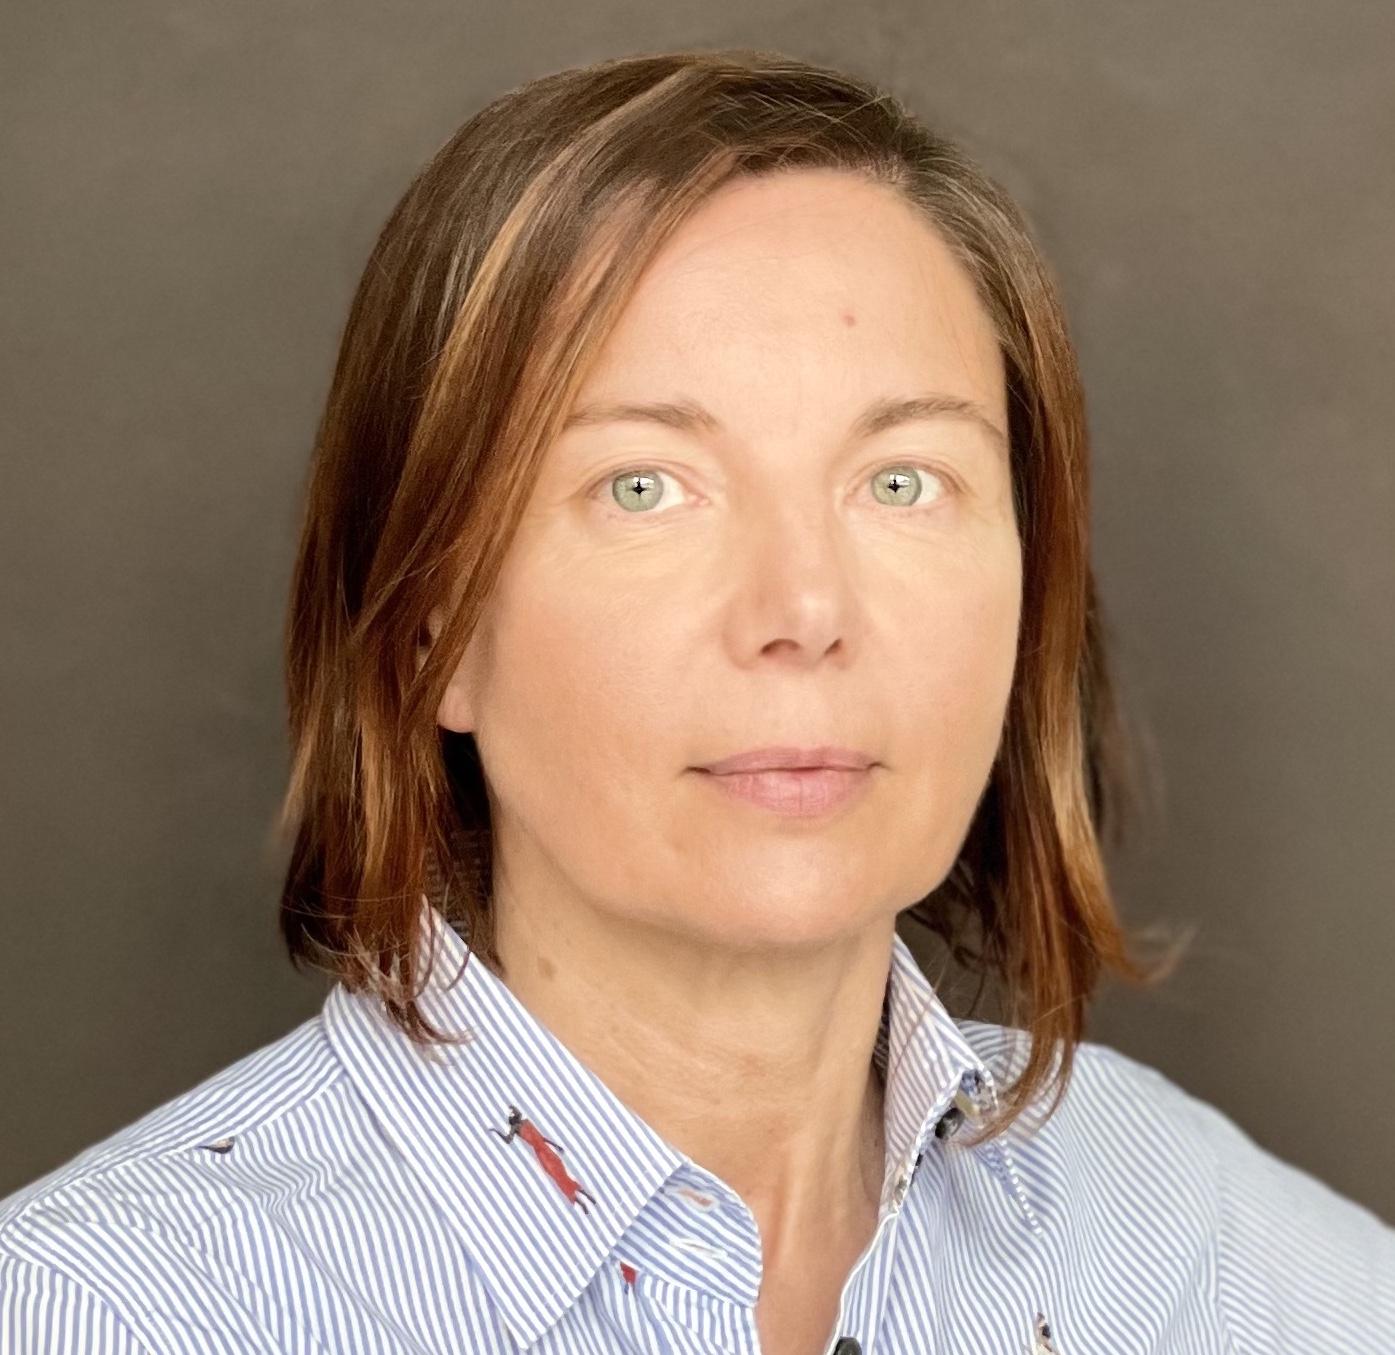 Lucia Cerini